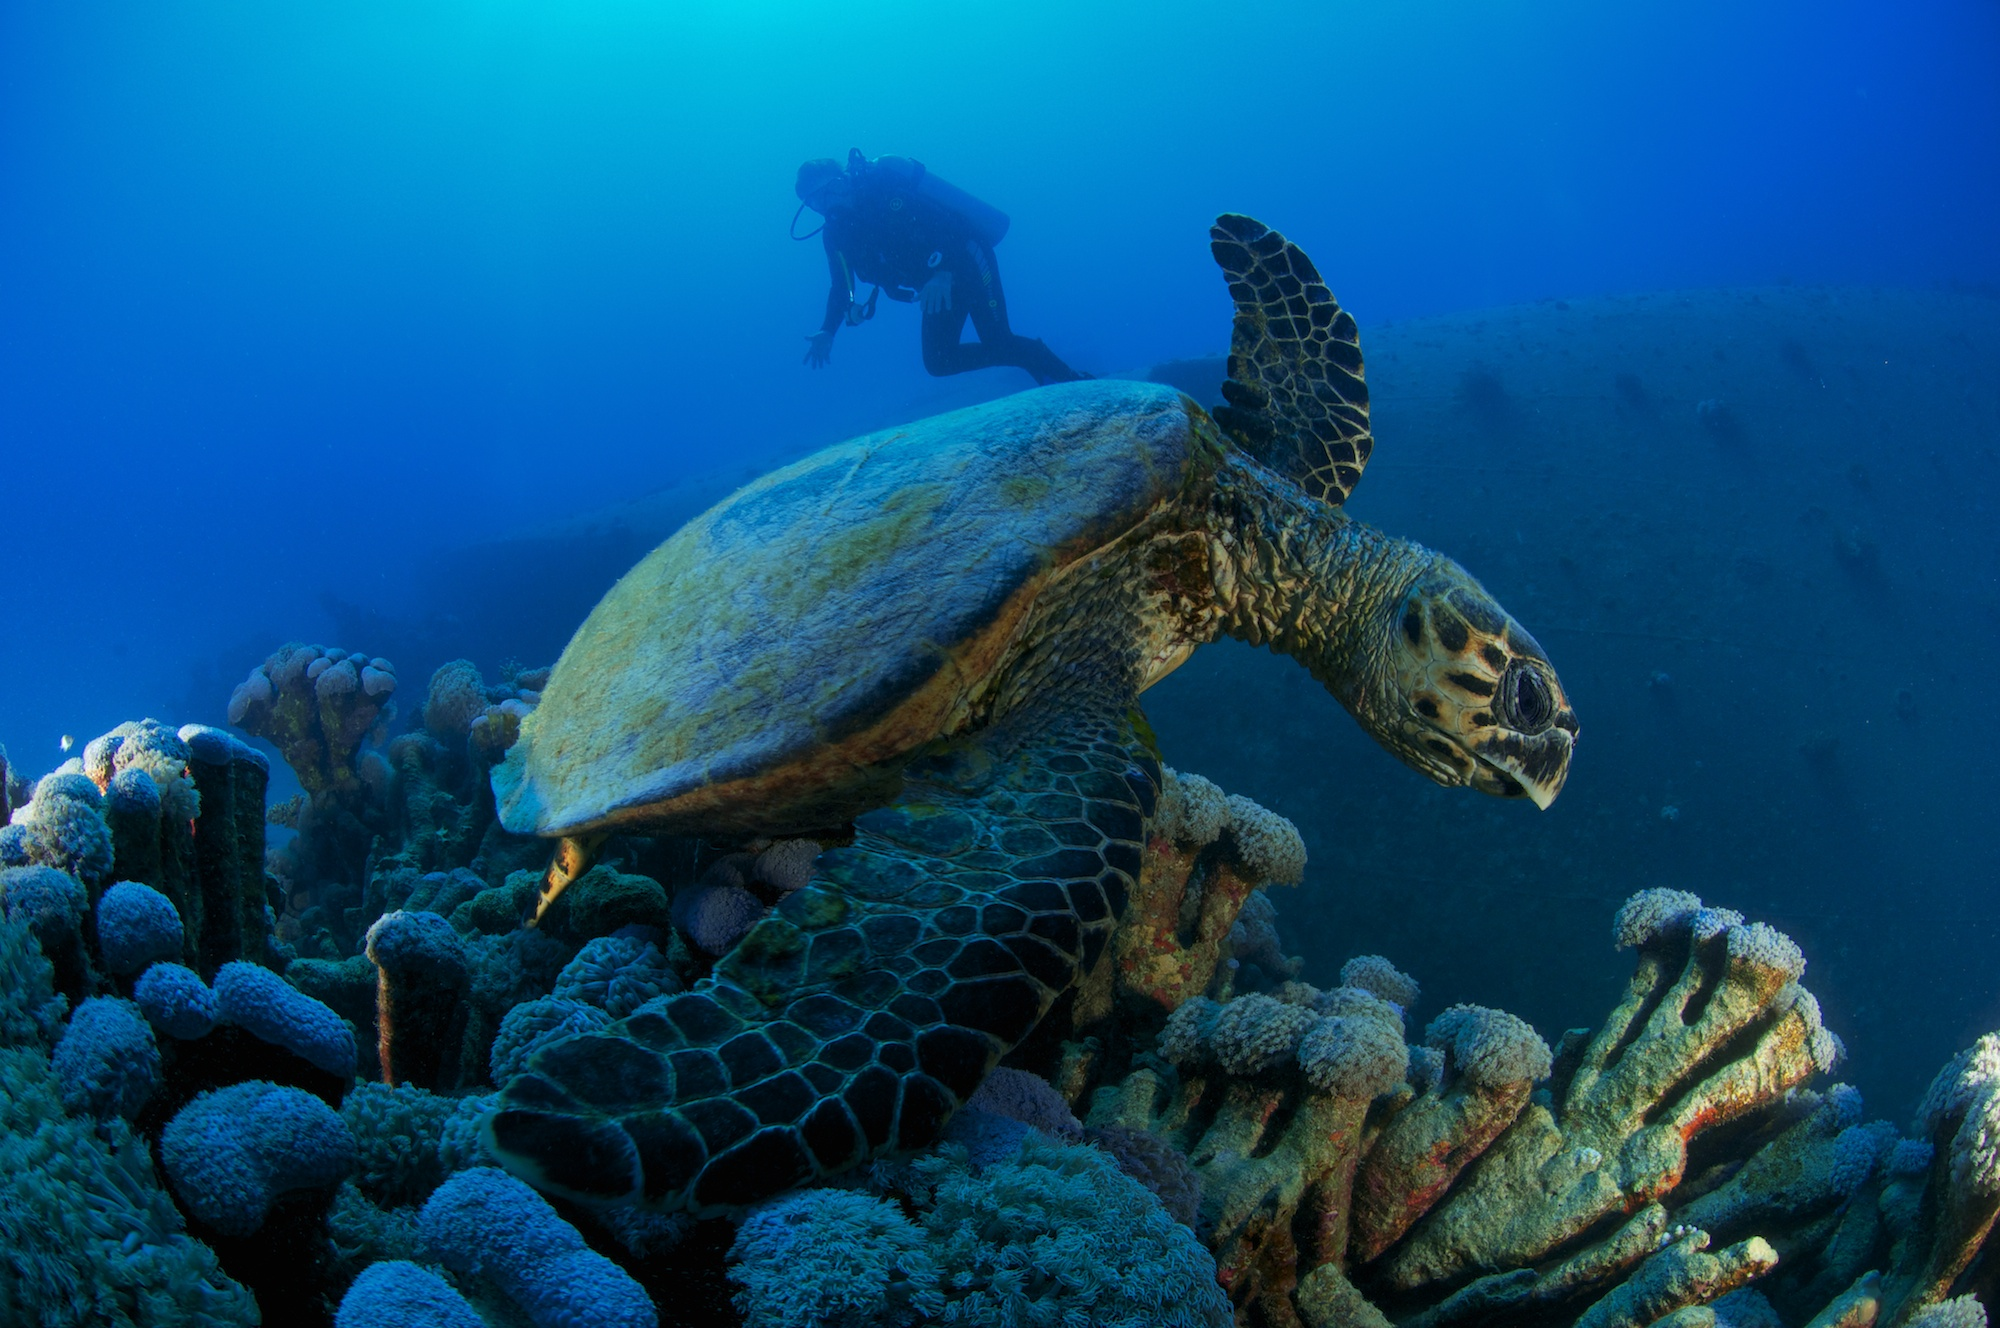 Sea Turtle, Abu Ghusun, southern Red Sea, Egypt